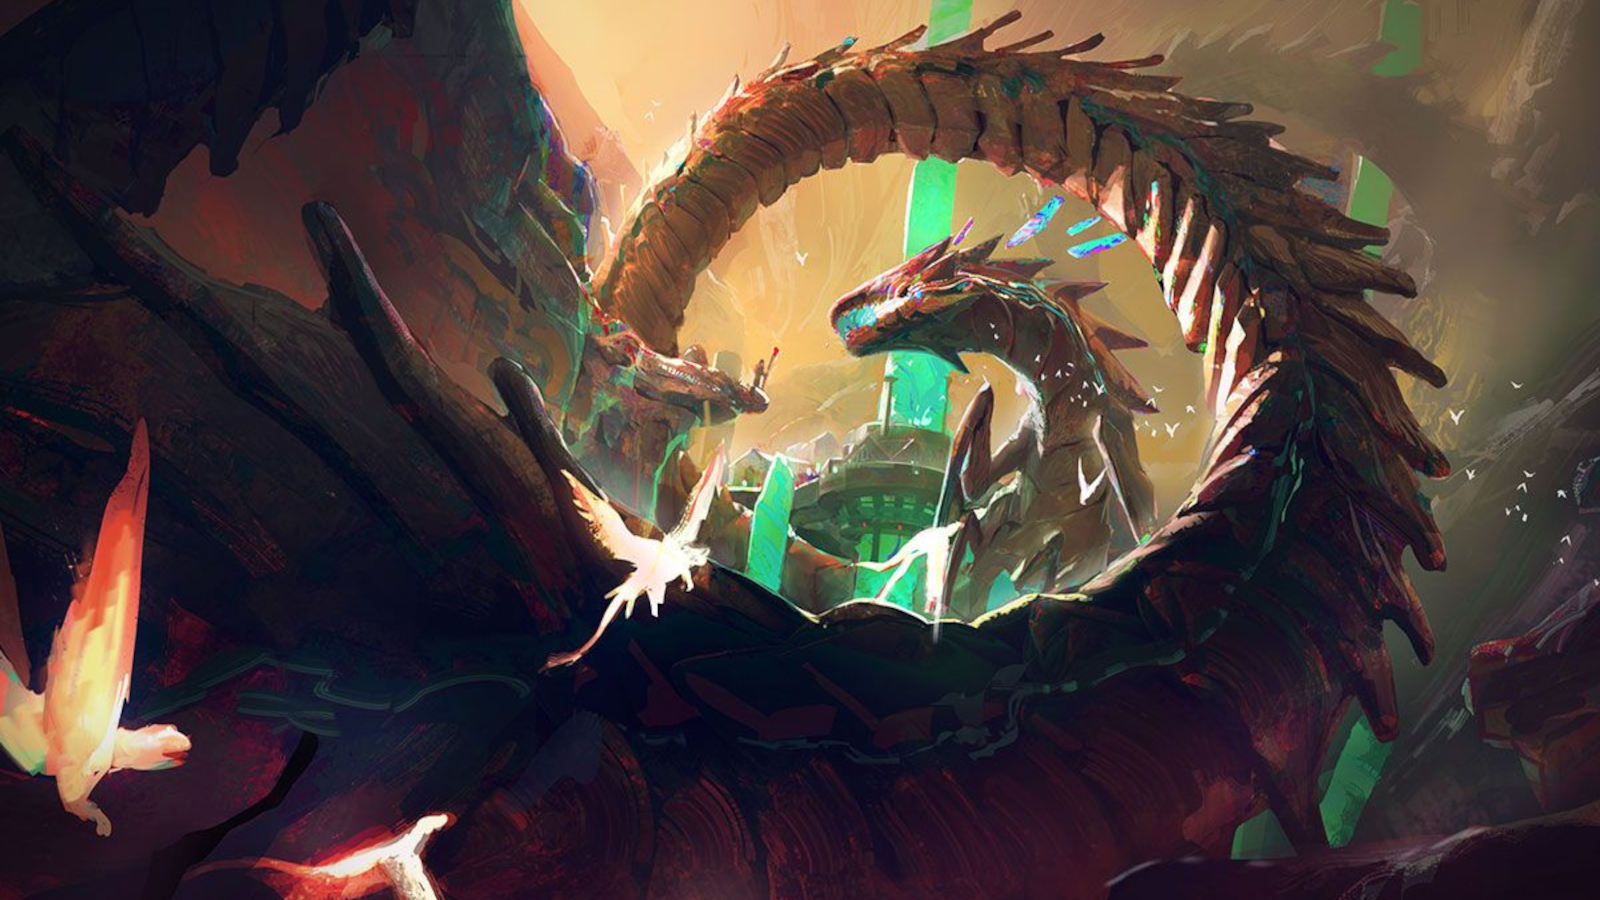 Anteprima – Volfyirion Guilds su Kickstarter